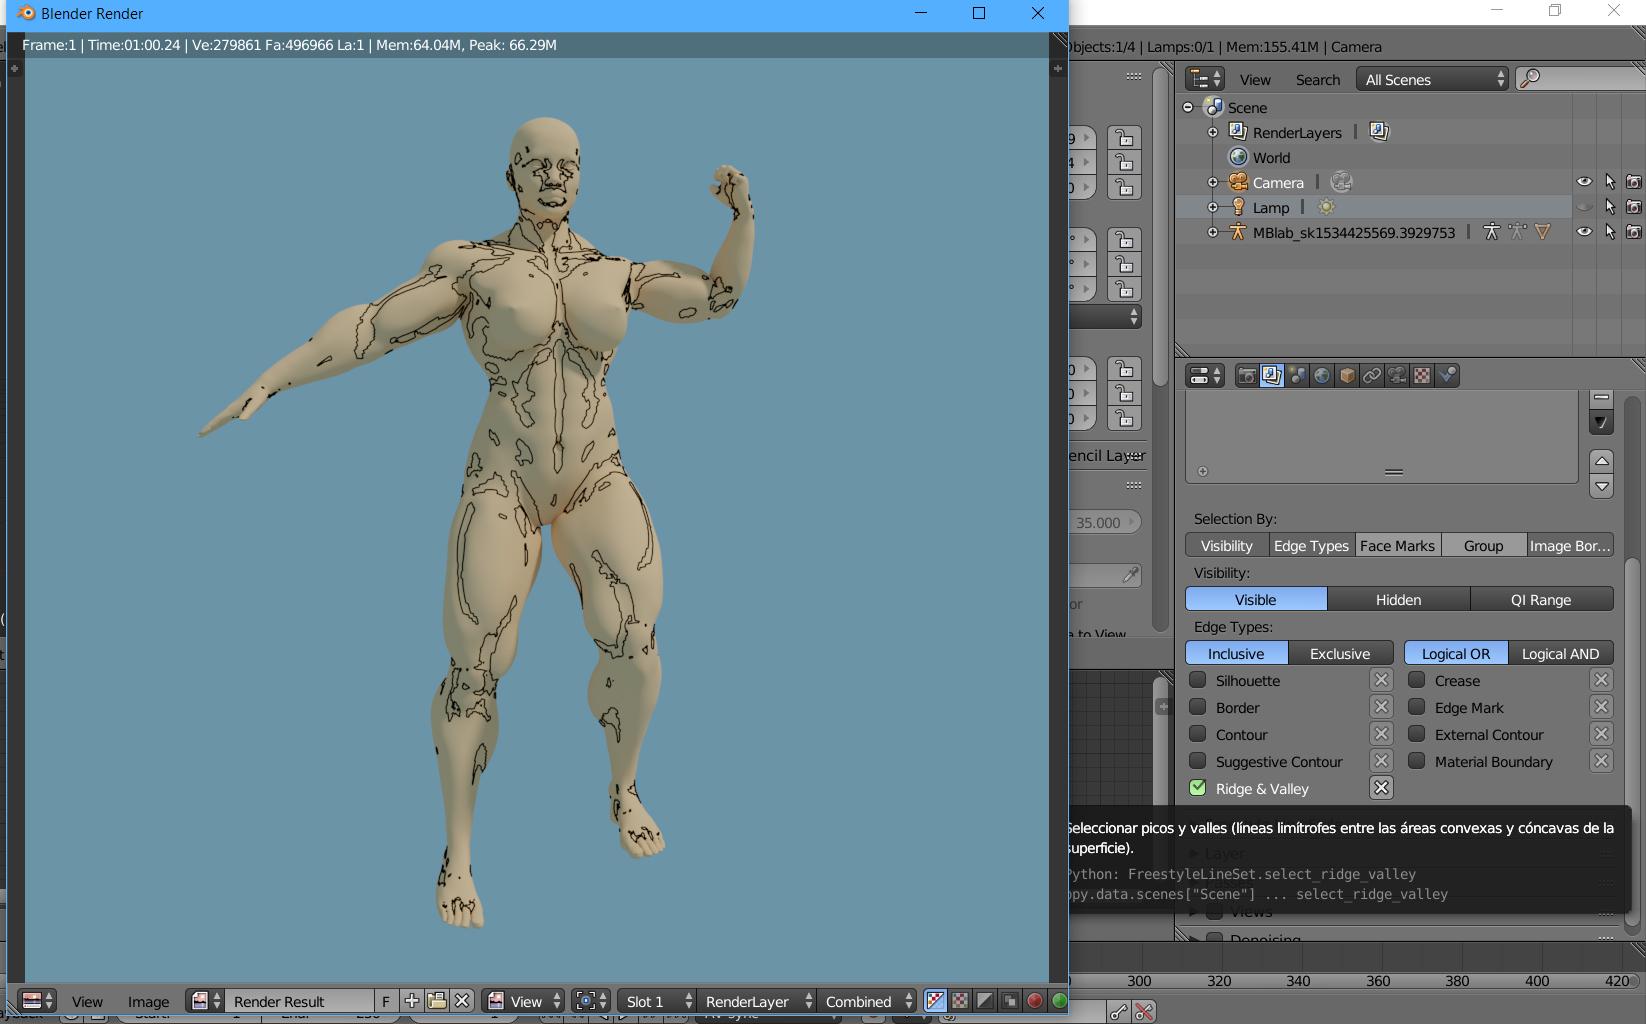 Blender y Freestyle-05_convexos_concavos.jpg